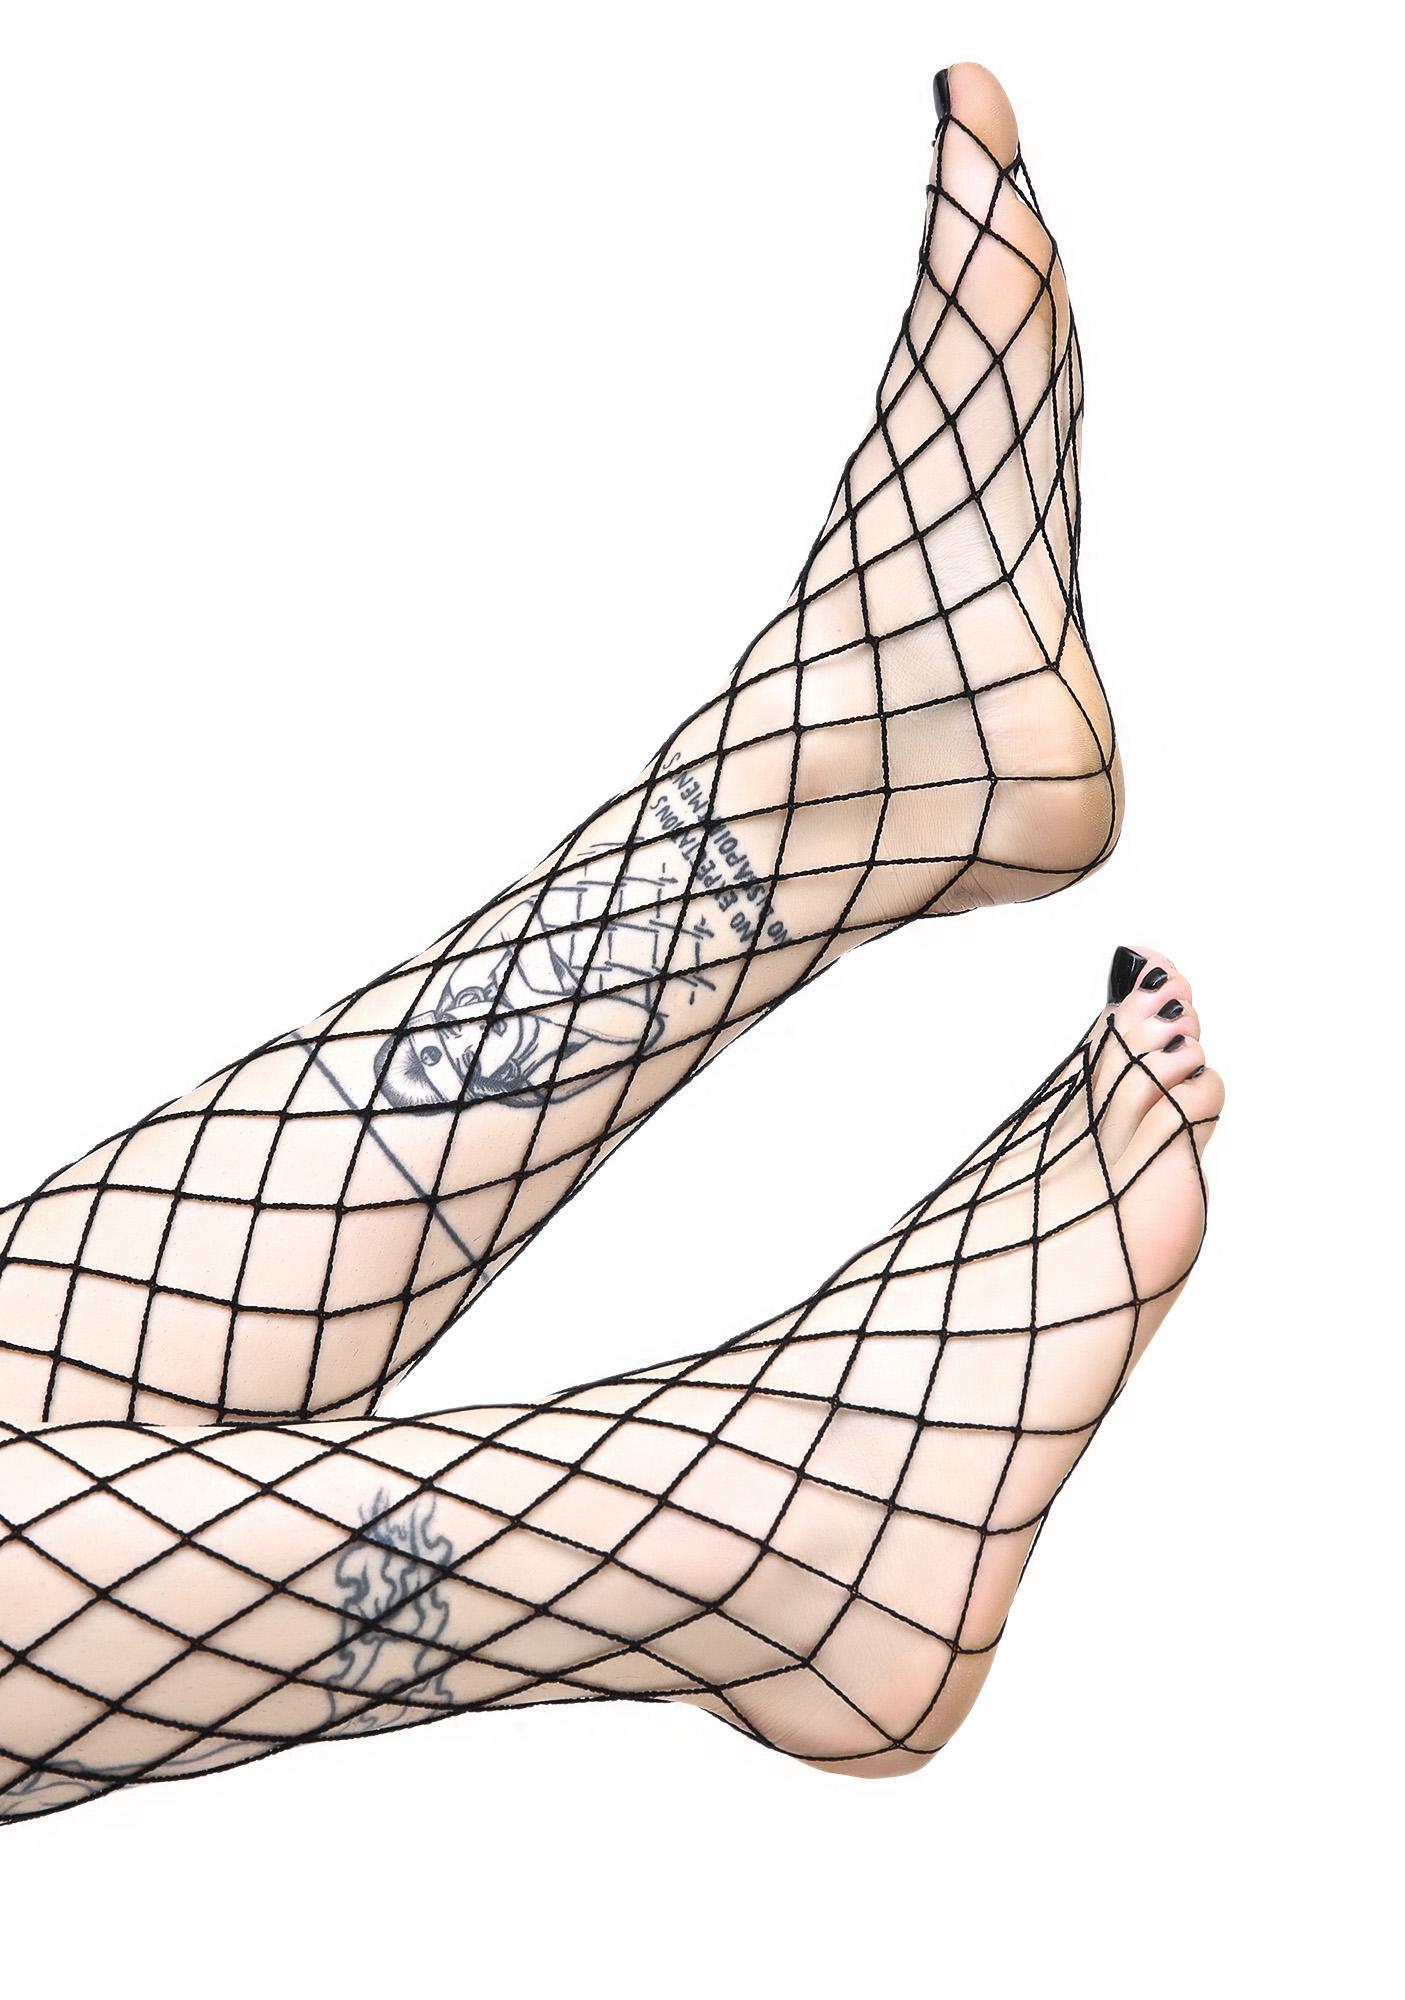 Worship Me Black Fence Net Thigh Highs